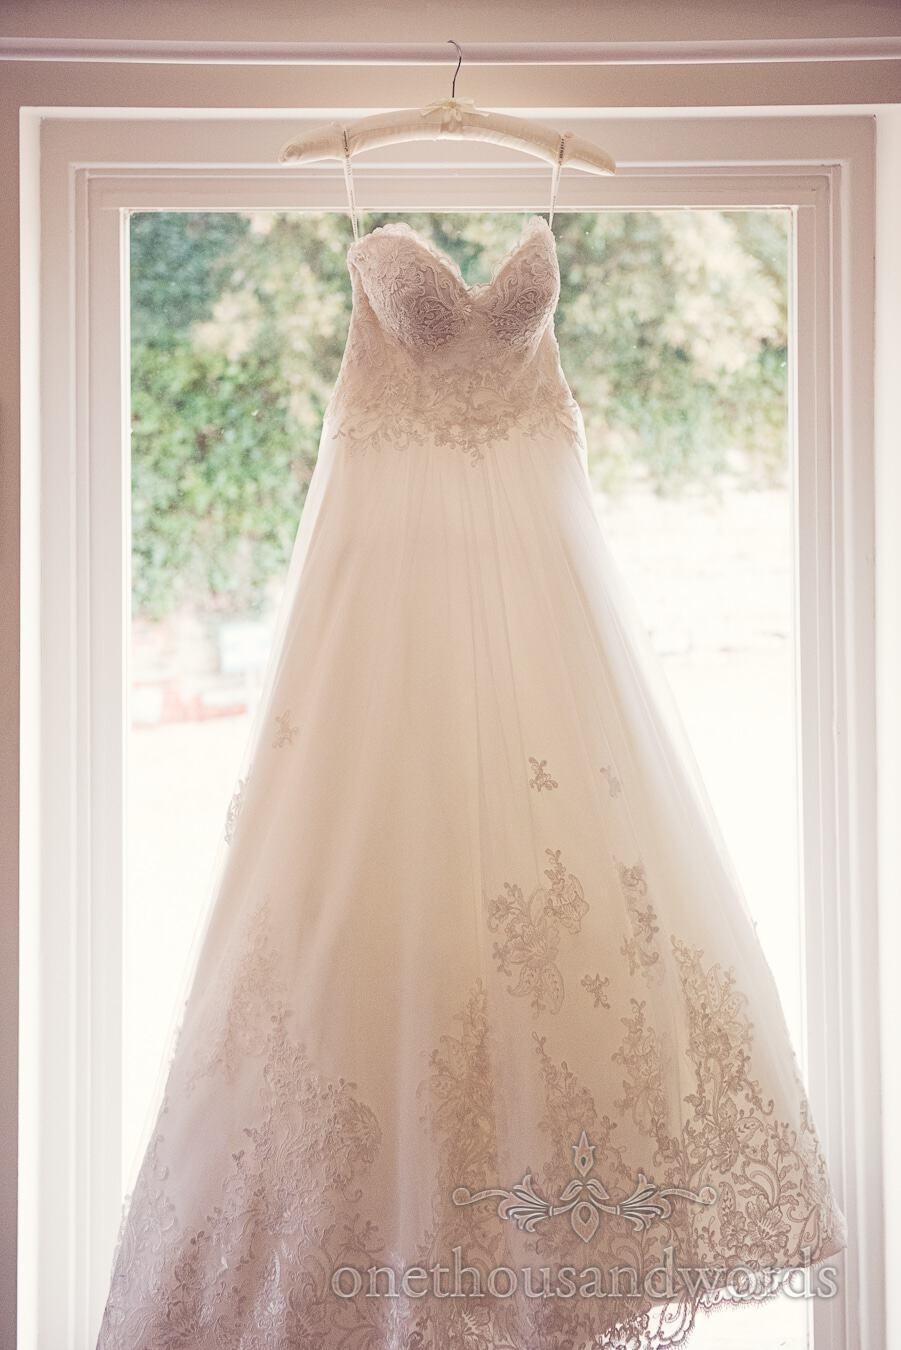 Dress hangs in window from wedding at Sopley Mill